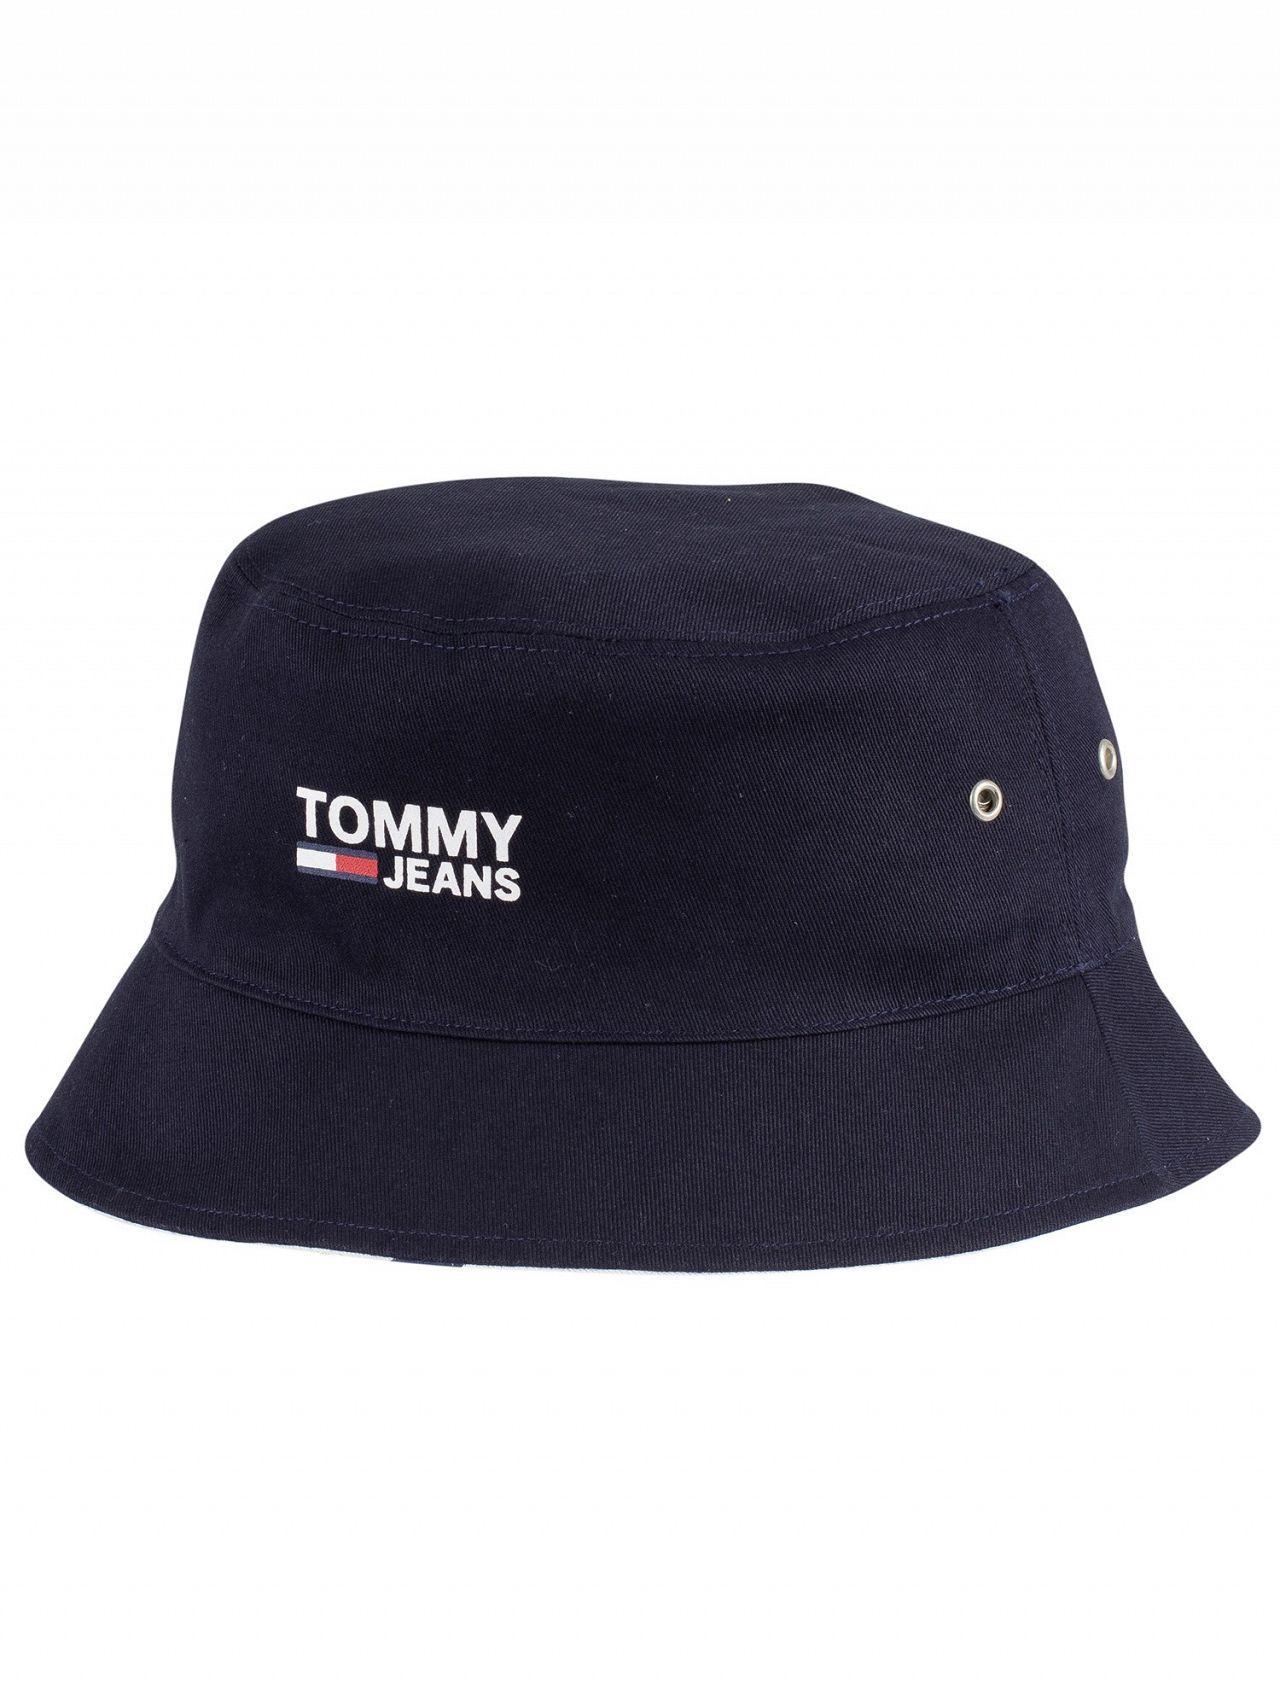 e090cef7 Tommy Hilfiger - Classic White Logo Reversible Bucket Hat for Men - Lyst.  View fullscreen